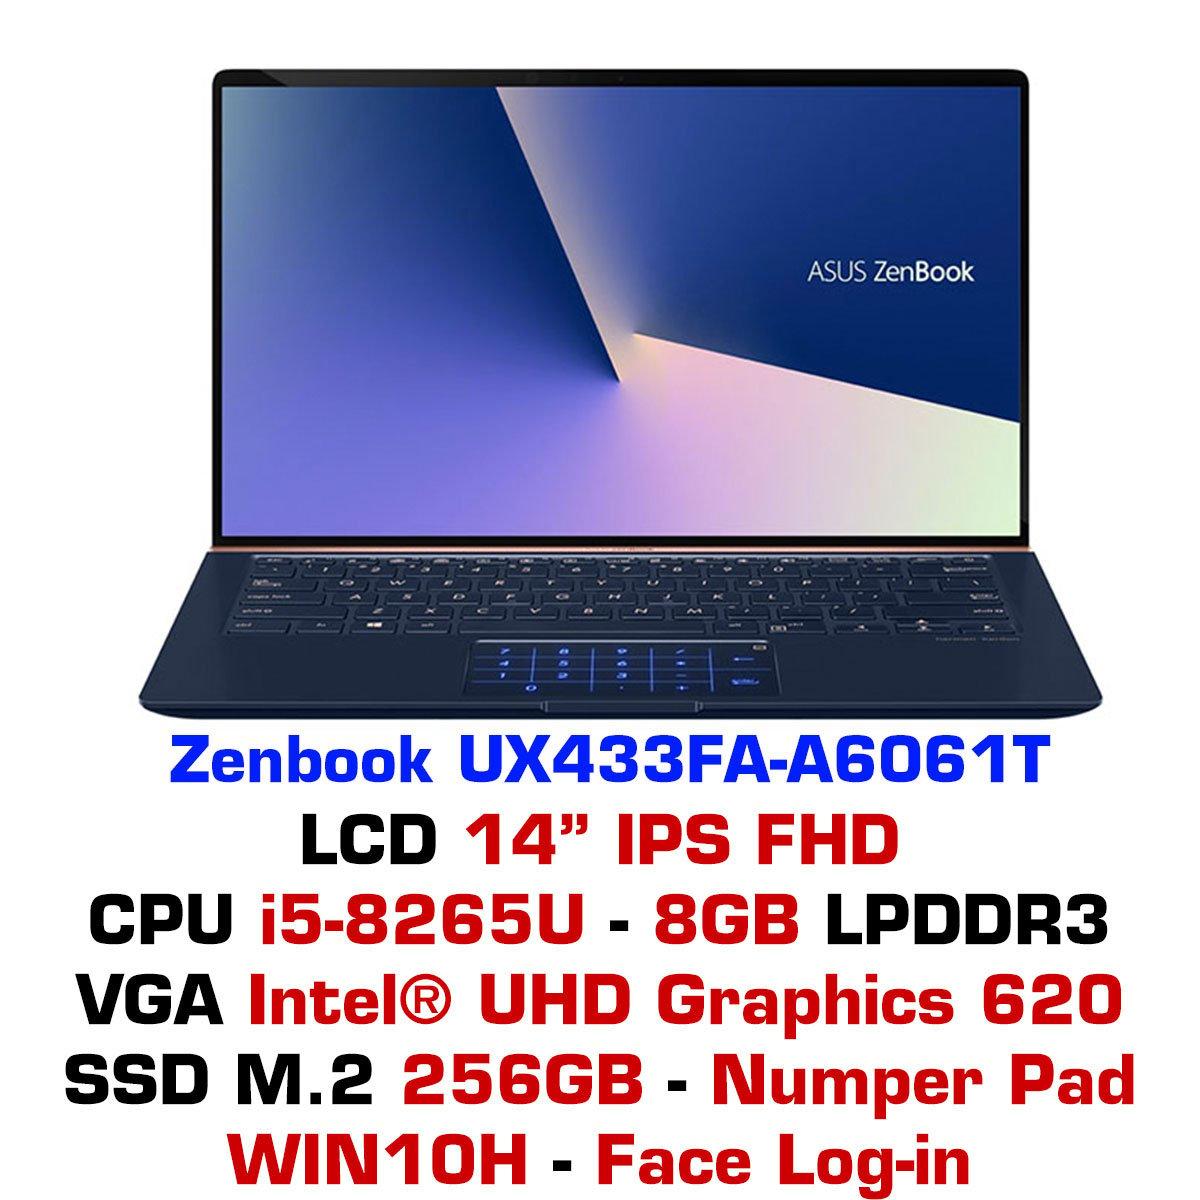 Laptop Asus ZenBook UX433FA-A6061T